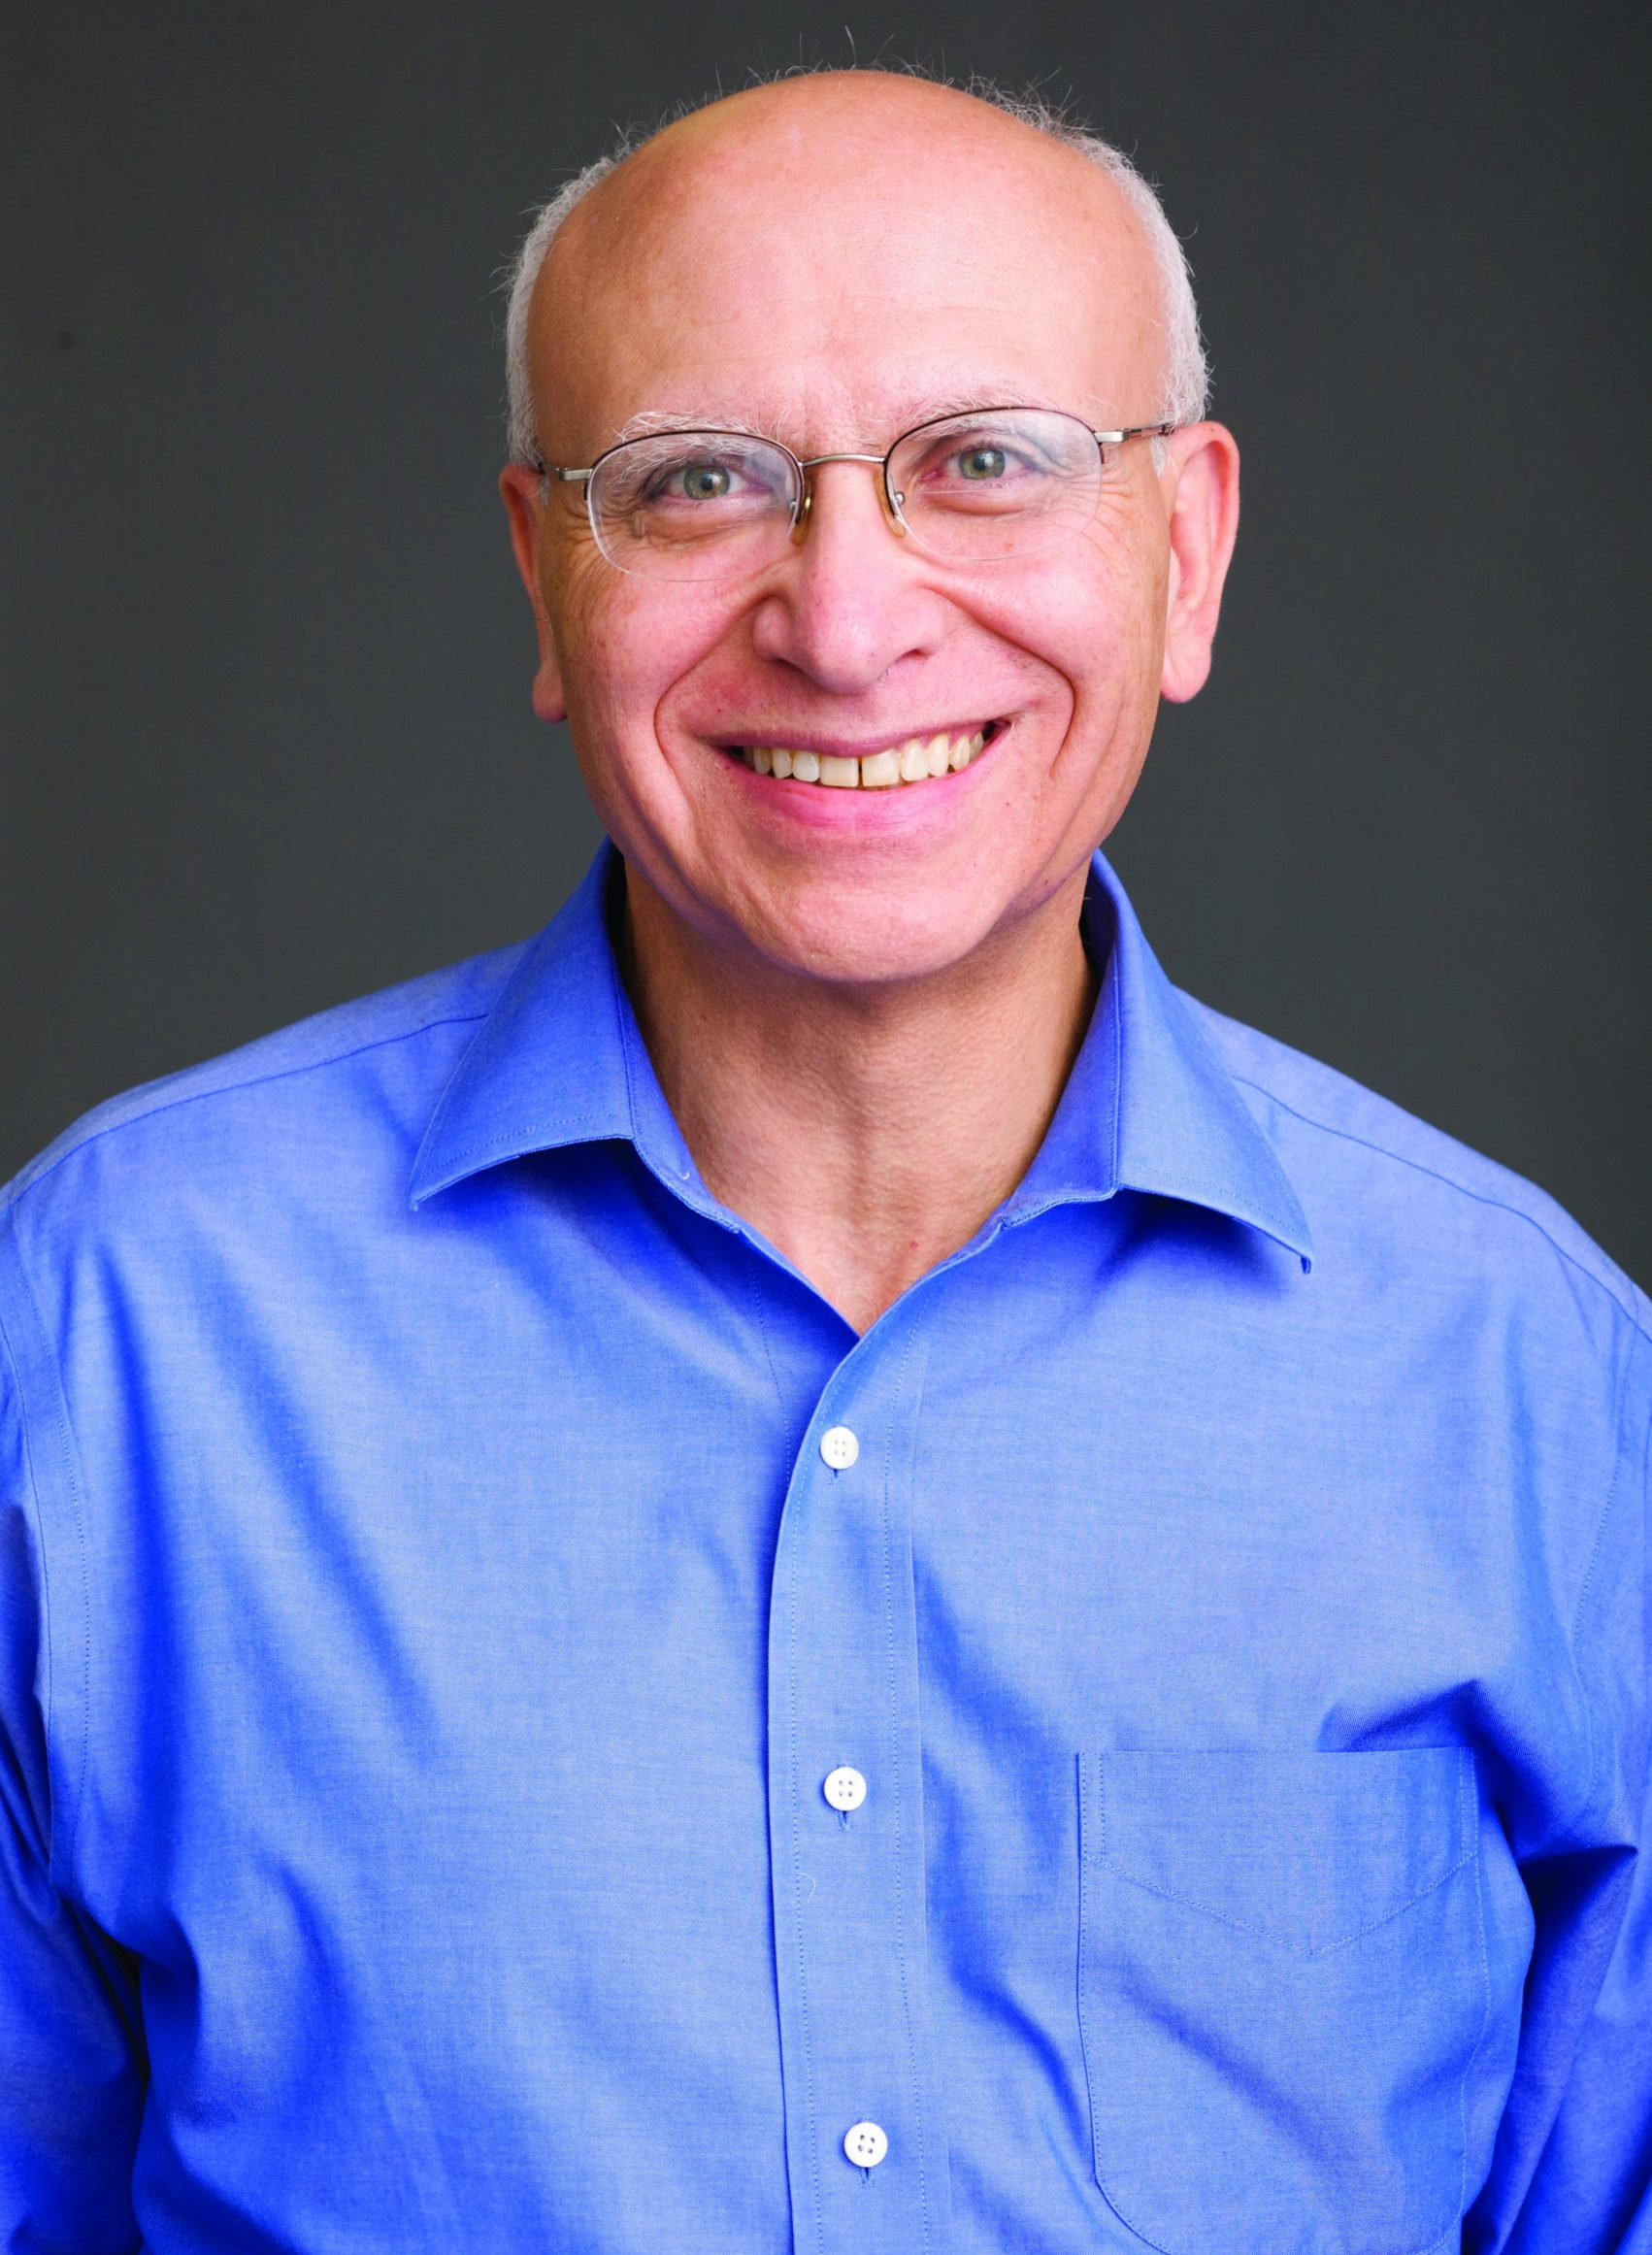 David Luban Headshot